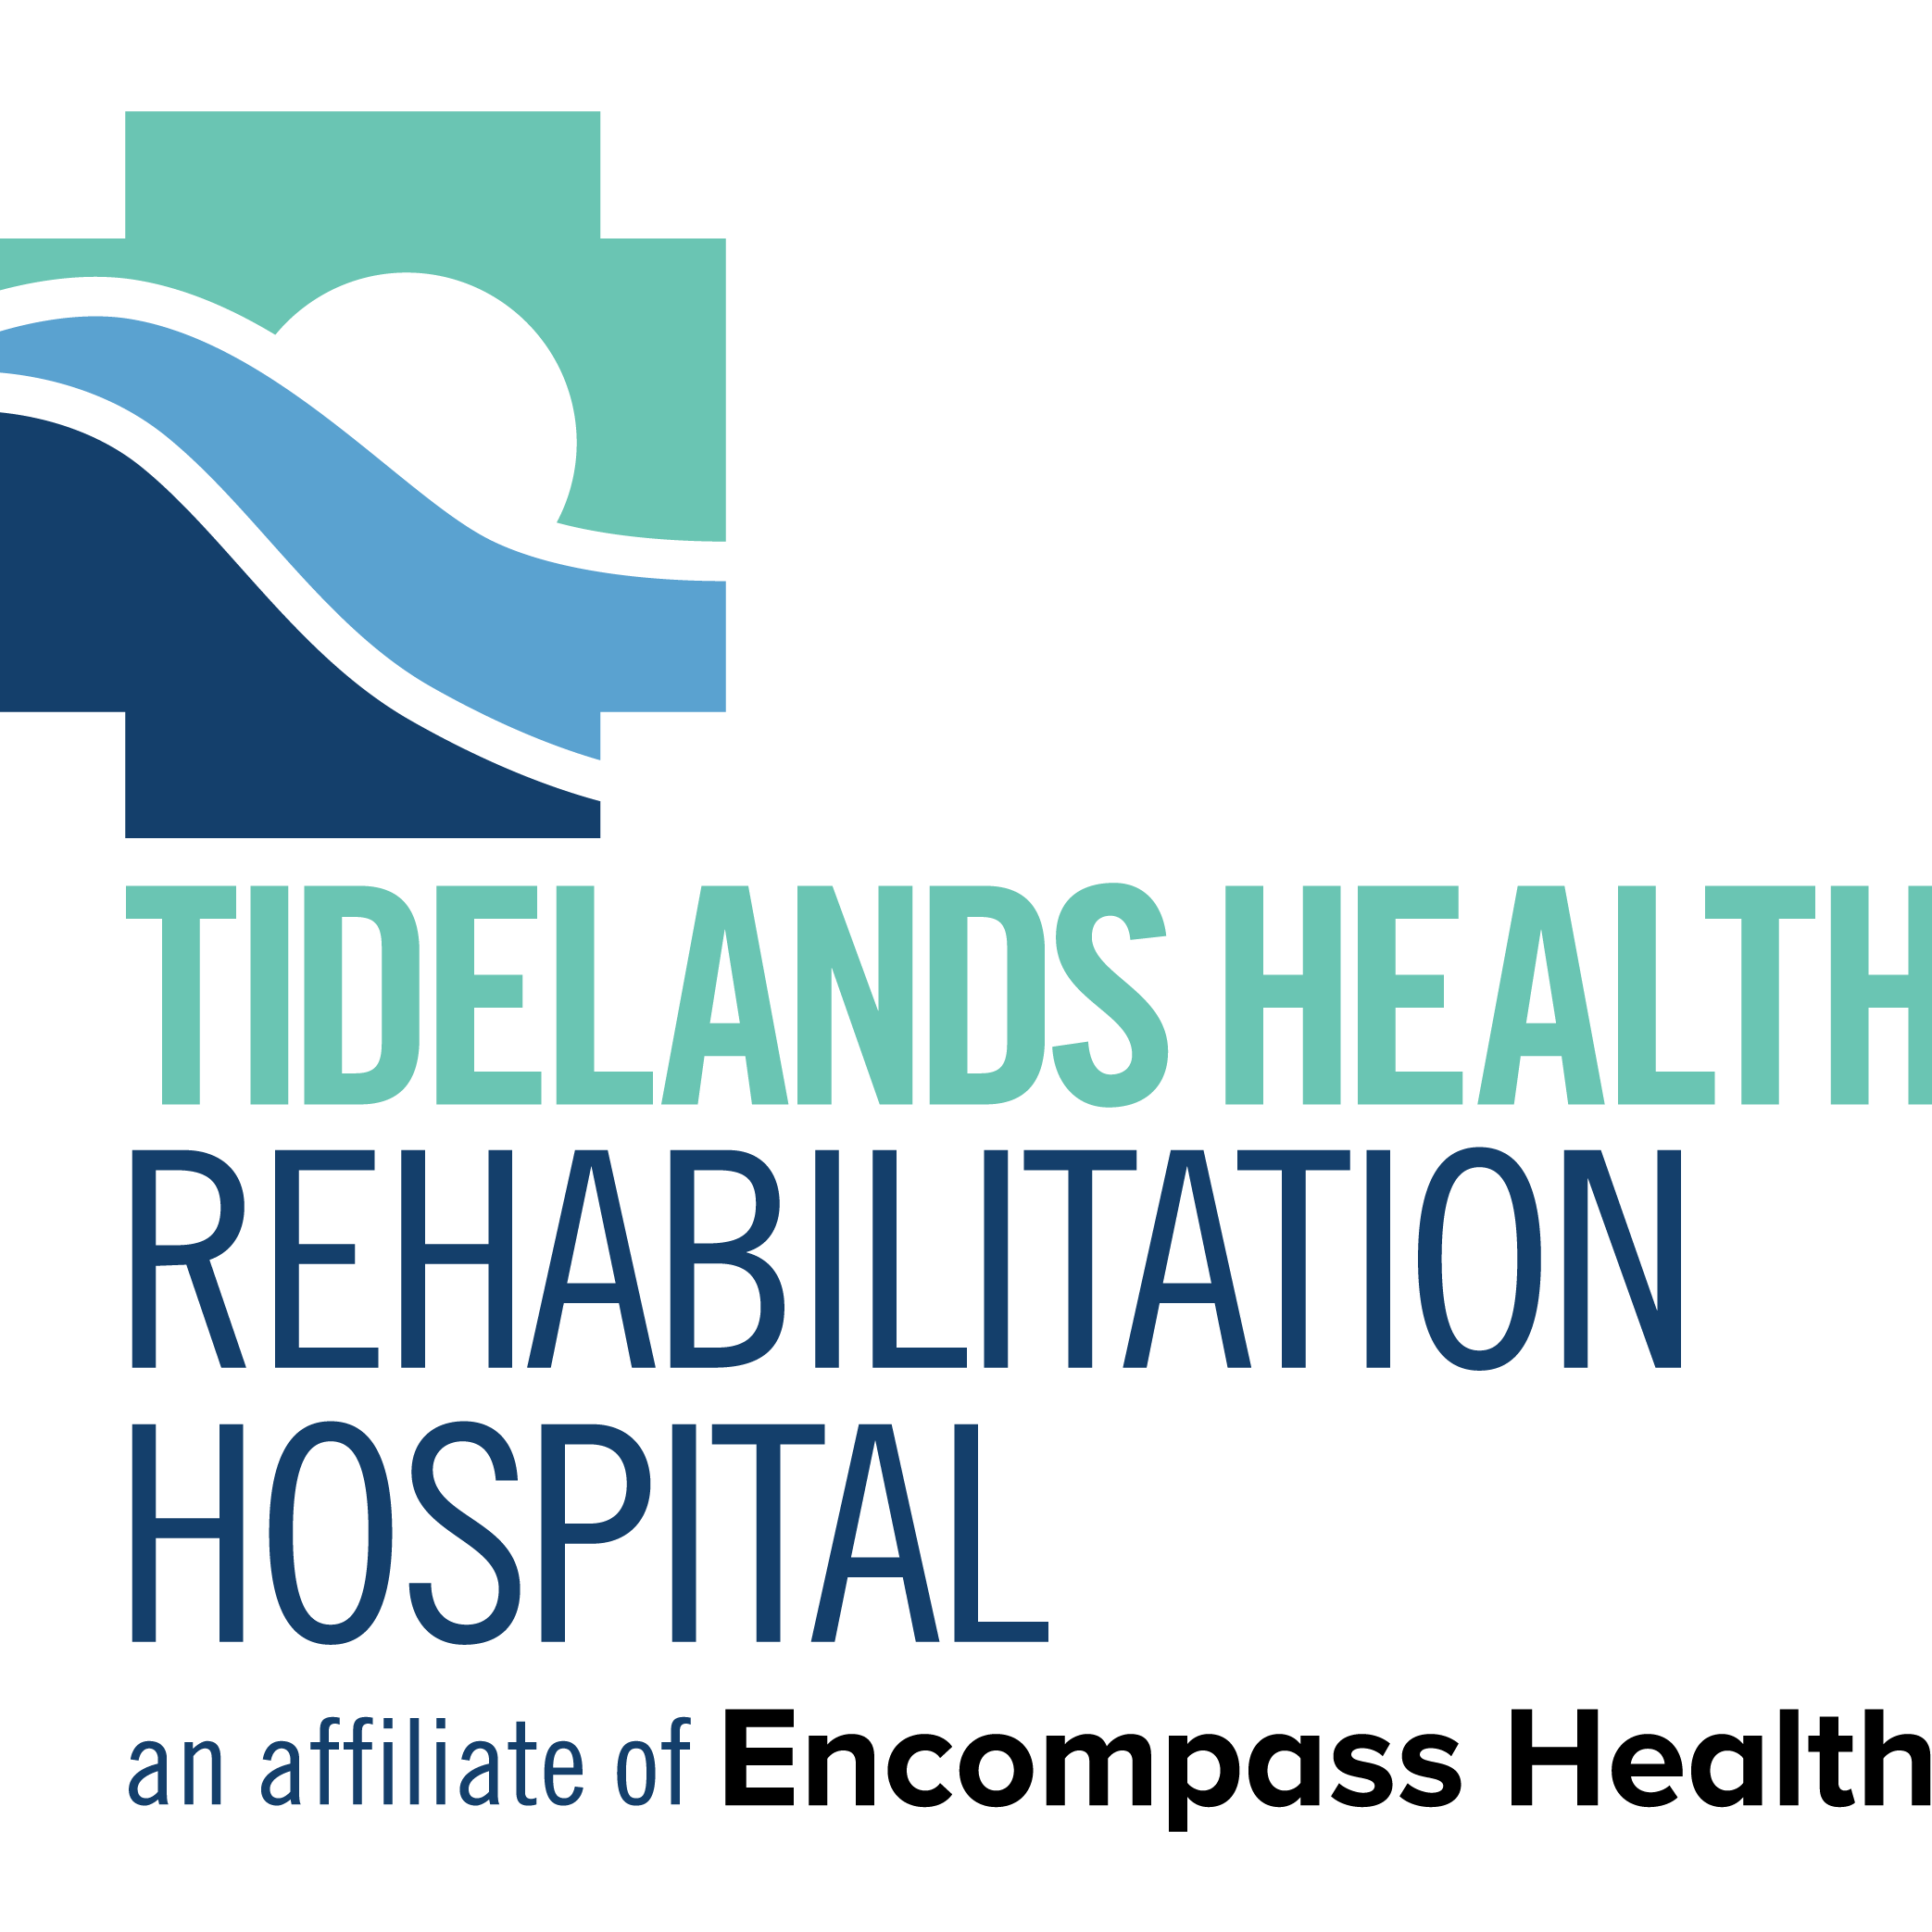 Tidelands Health Rehabilitation Hospital, an affiliate of Encompass Health